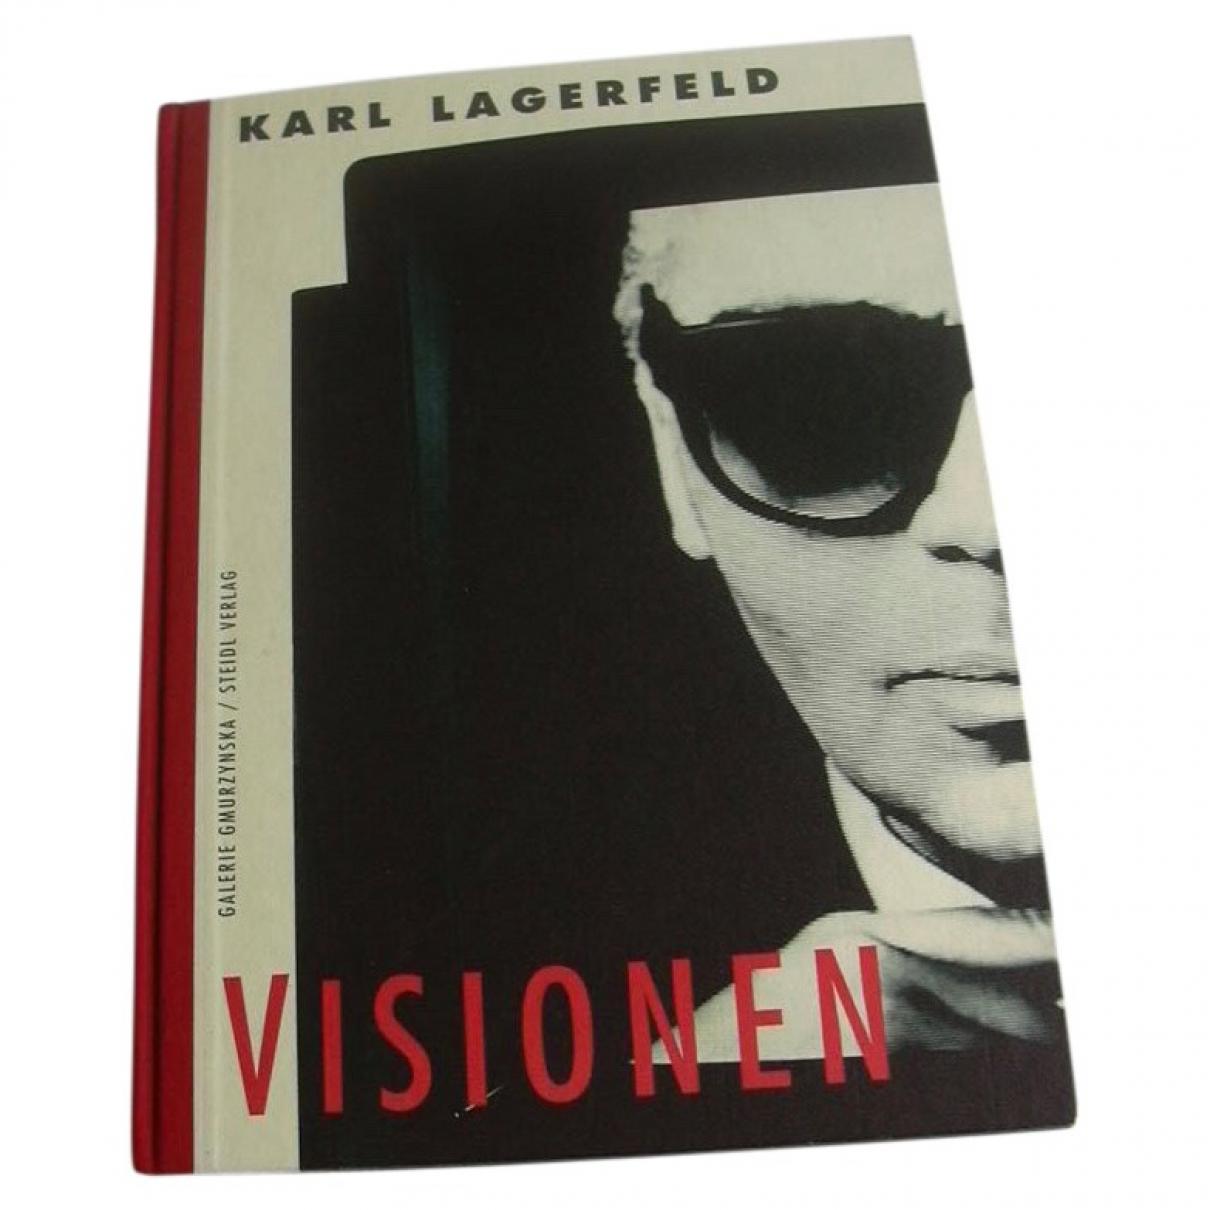 Karl Lagerfeld - Photographie   pour lifestyle en coton - anthracite